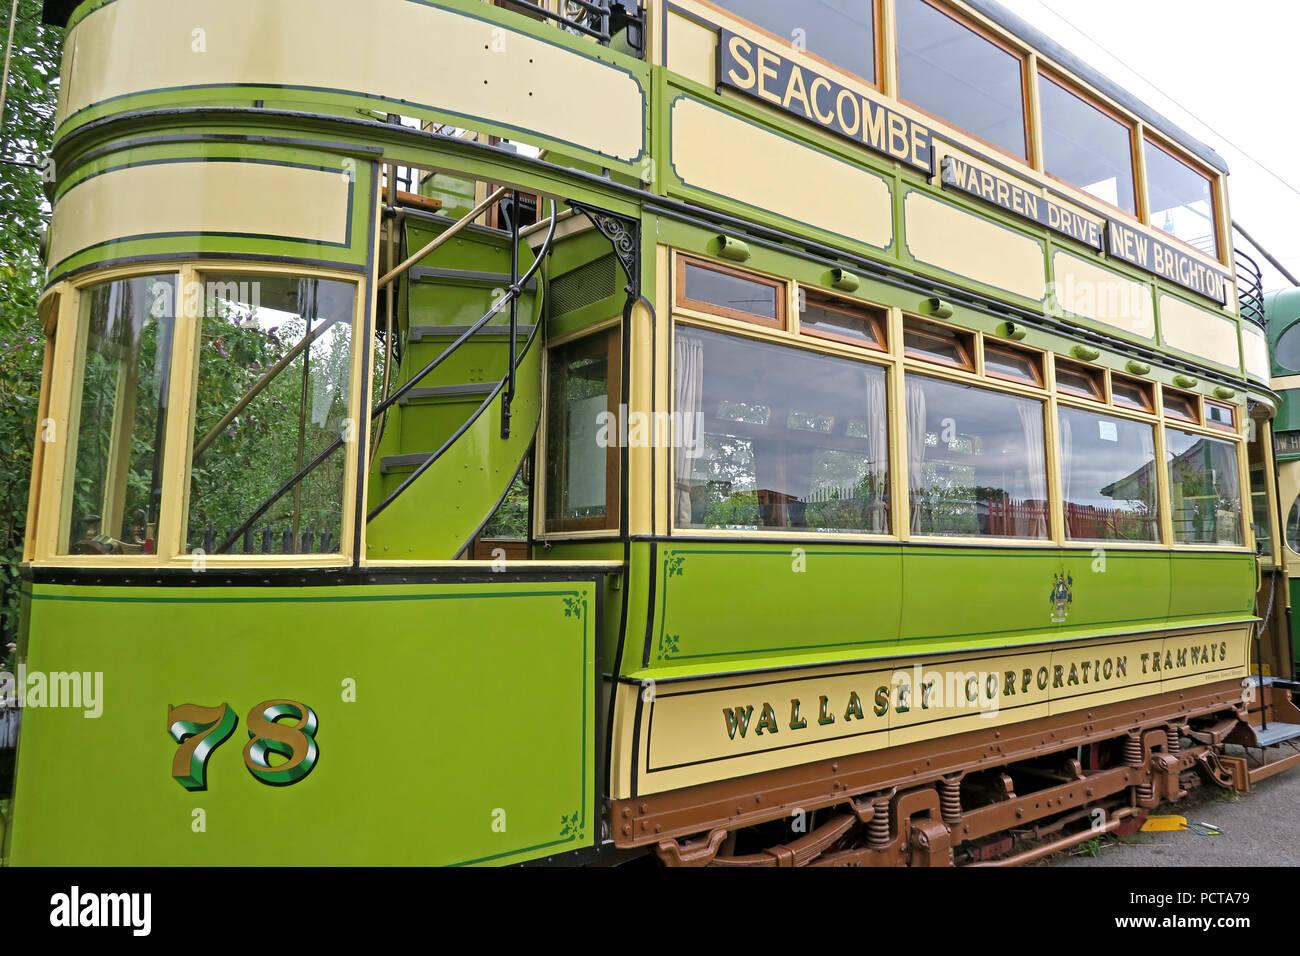 GoTonySmith,@HotpixUK,Transport,tram,trams,Birkenhead,green,cream,creme,north west England,UK,England,public,public trams,public tram,history,historic,electric,78 Seacombe tram,78,Seacombe tram,78 Seacombe